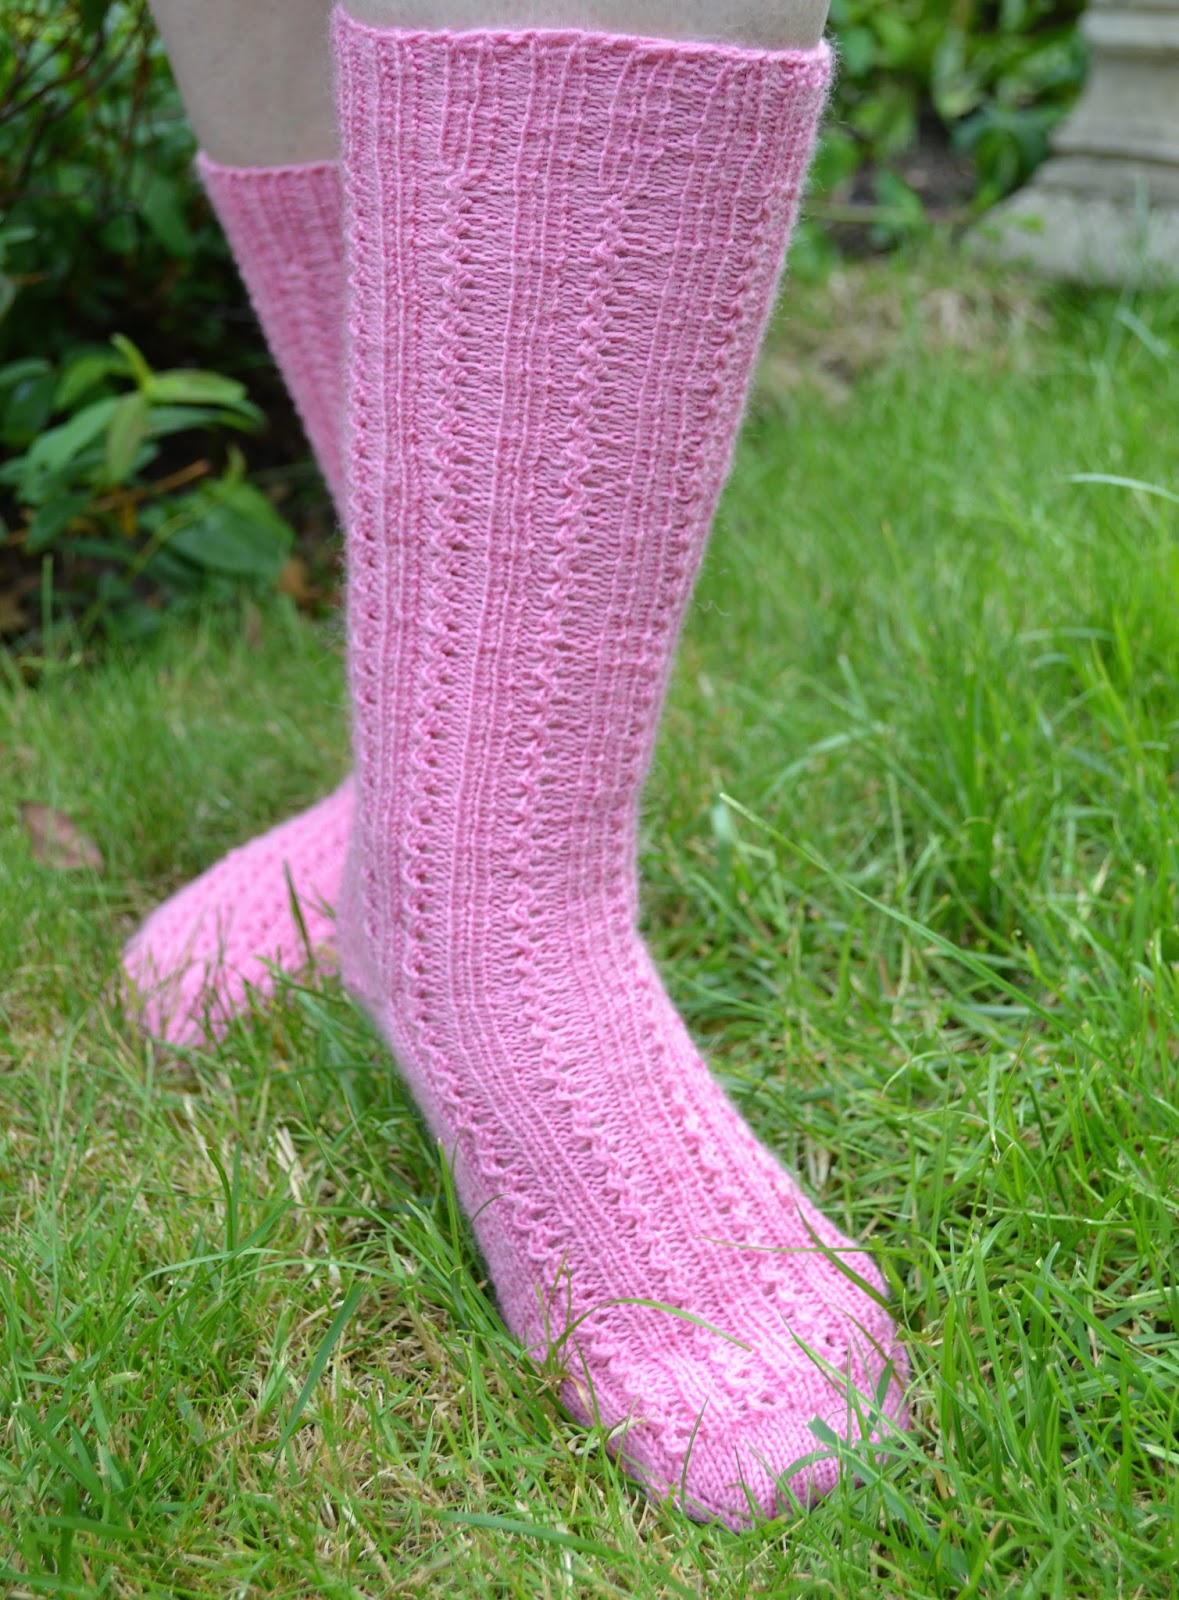 My Pretty Pink Gel Nails: Ginx Craft: My Pretty Pink Socks